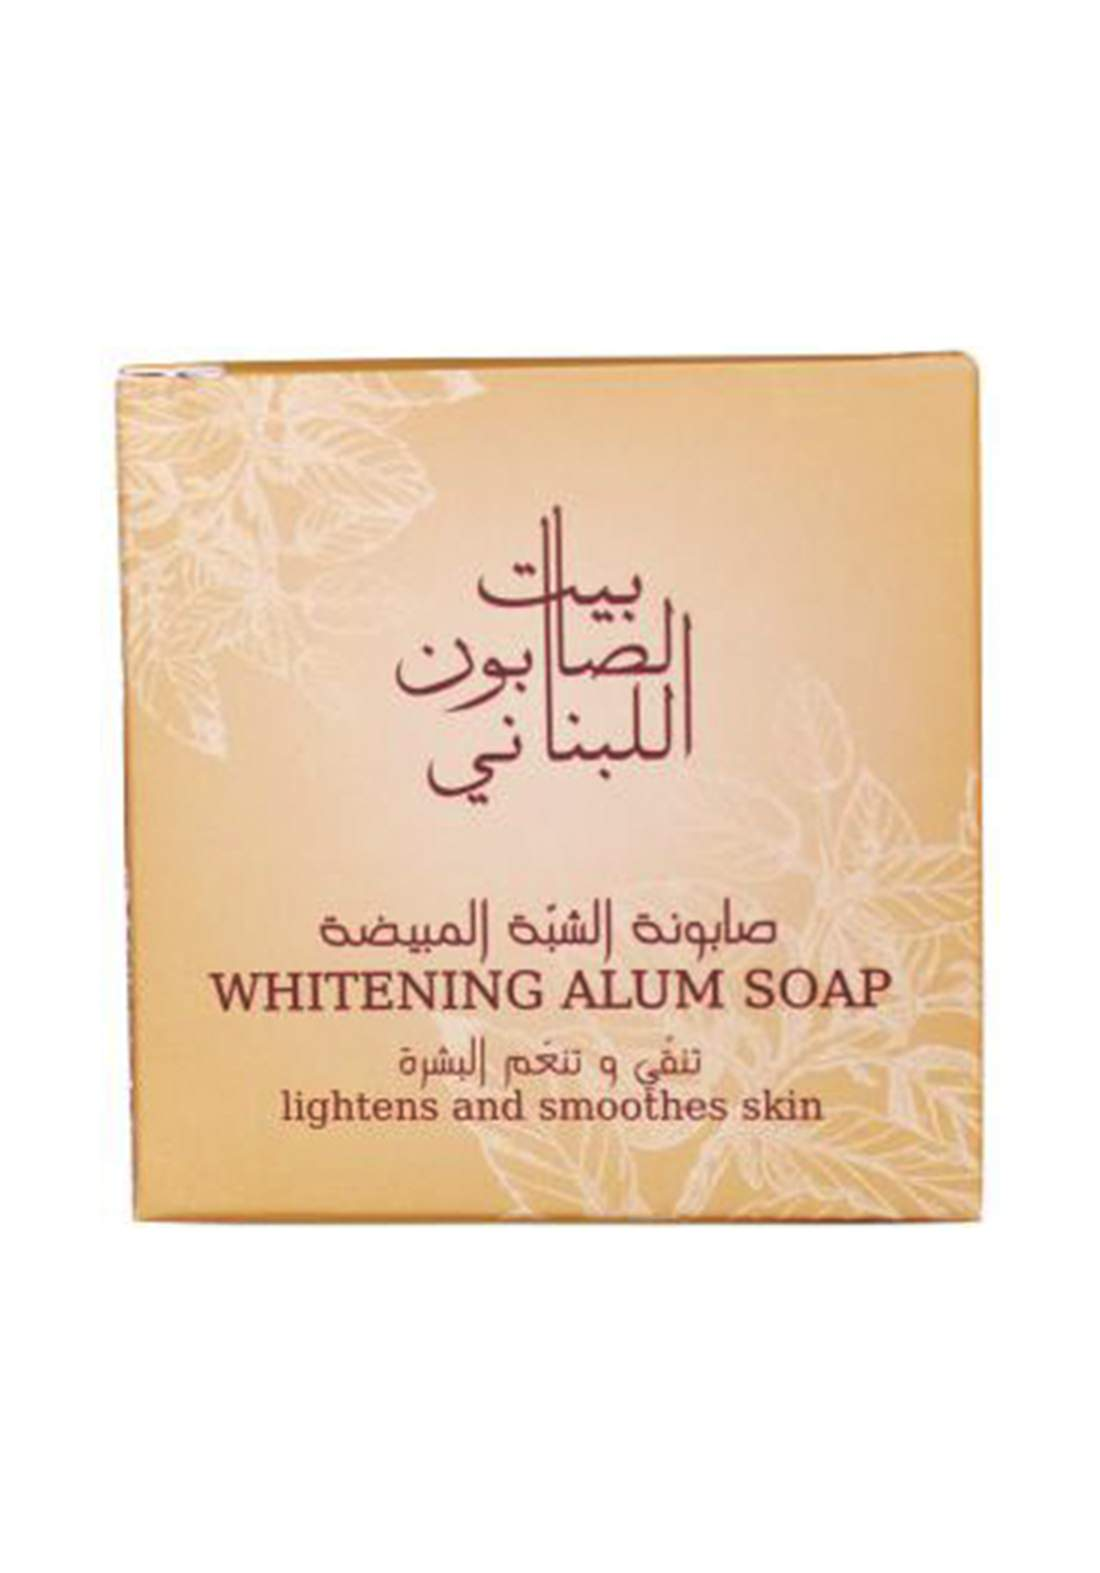 Bayt Alsaboun Alloubnani-317454 Whitening Alum Soap 120g صابونة